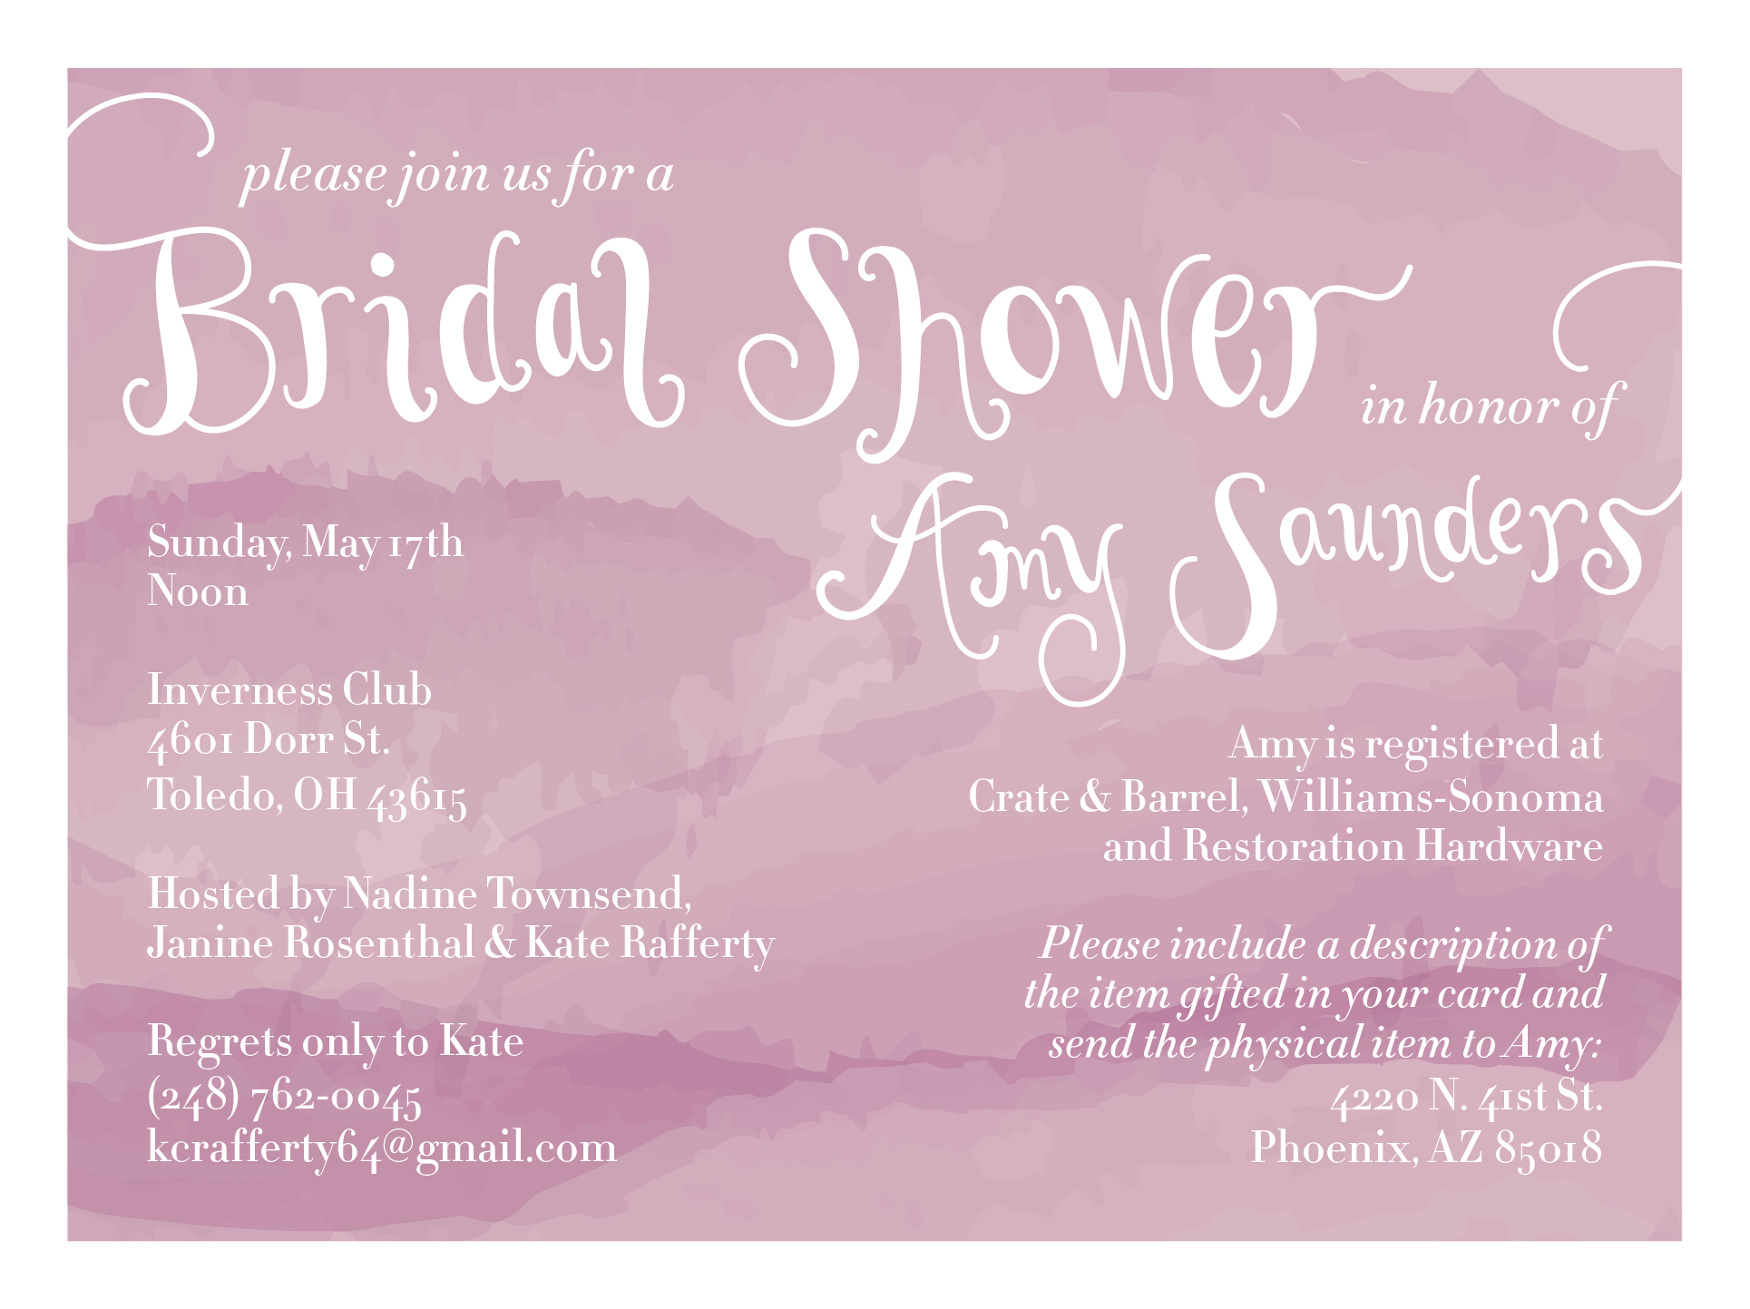 Wedding Design - Hannah Saunders | Art Director